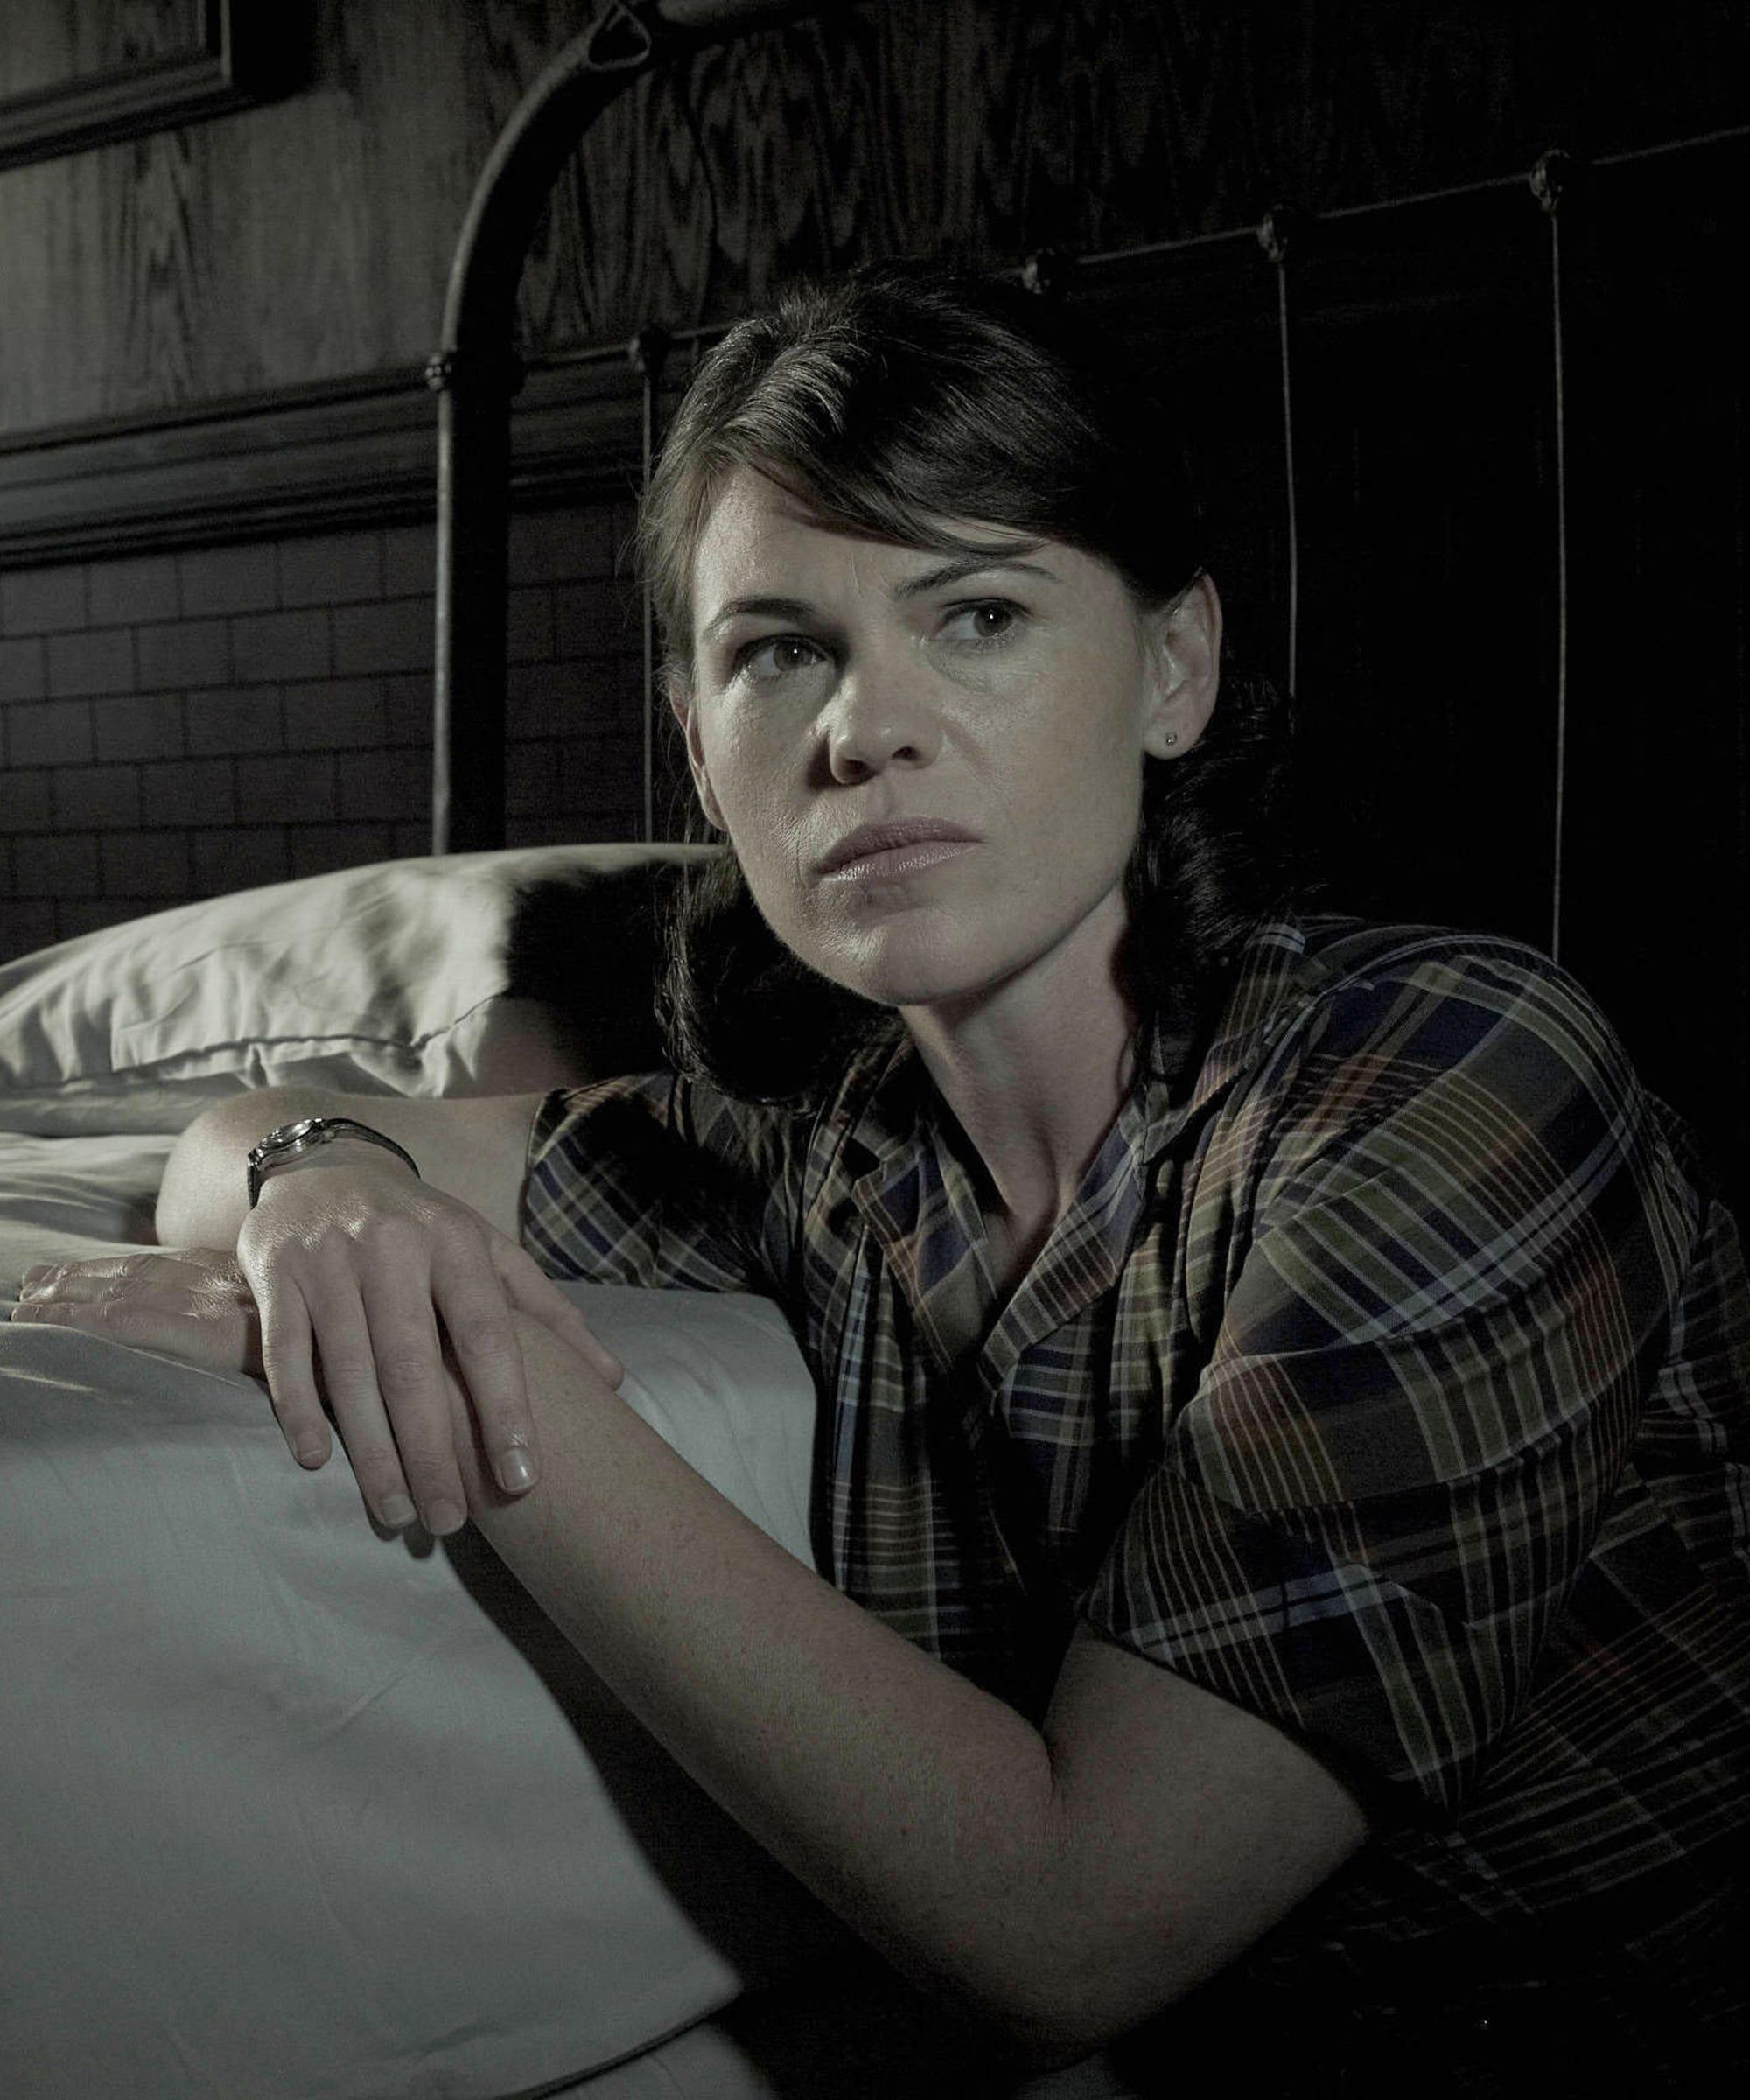 American Horror Story Moira And Elizabeth american horror story themesseasons 1-7 ryan murphy